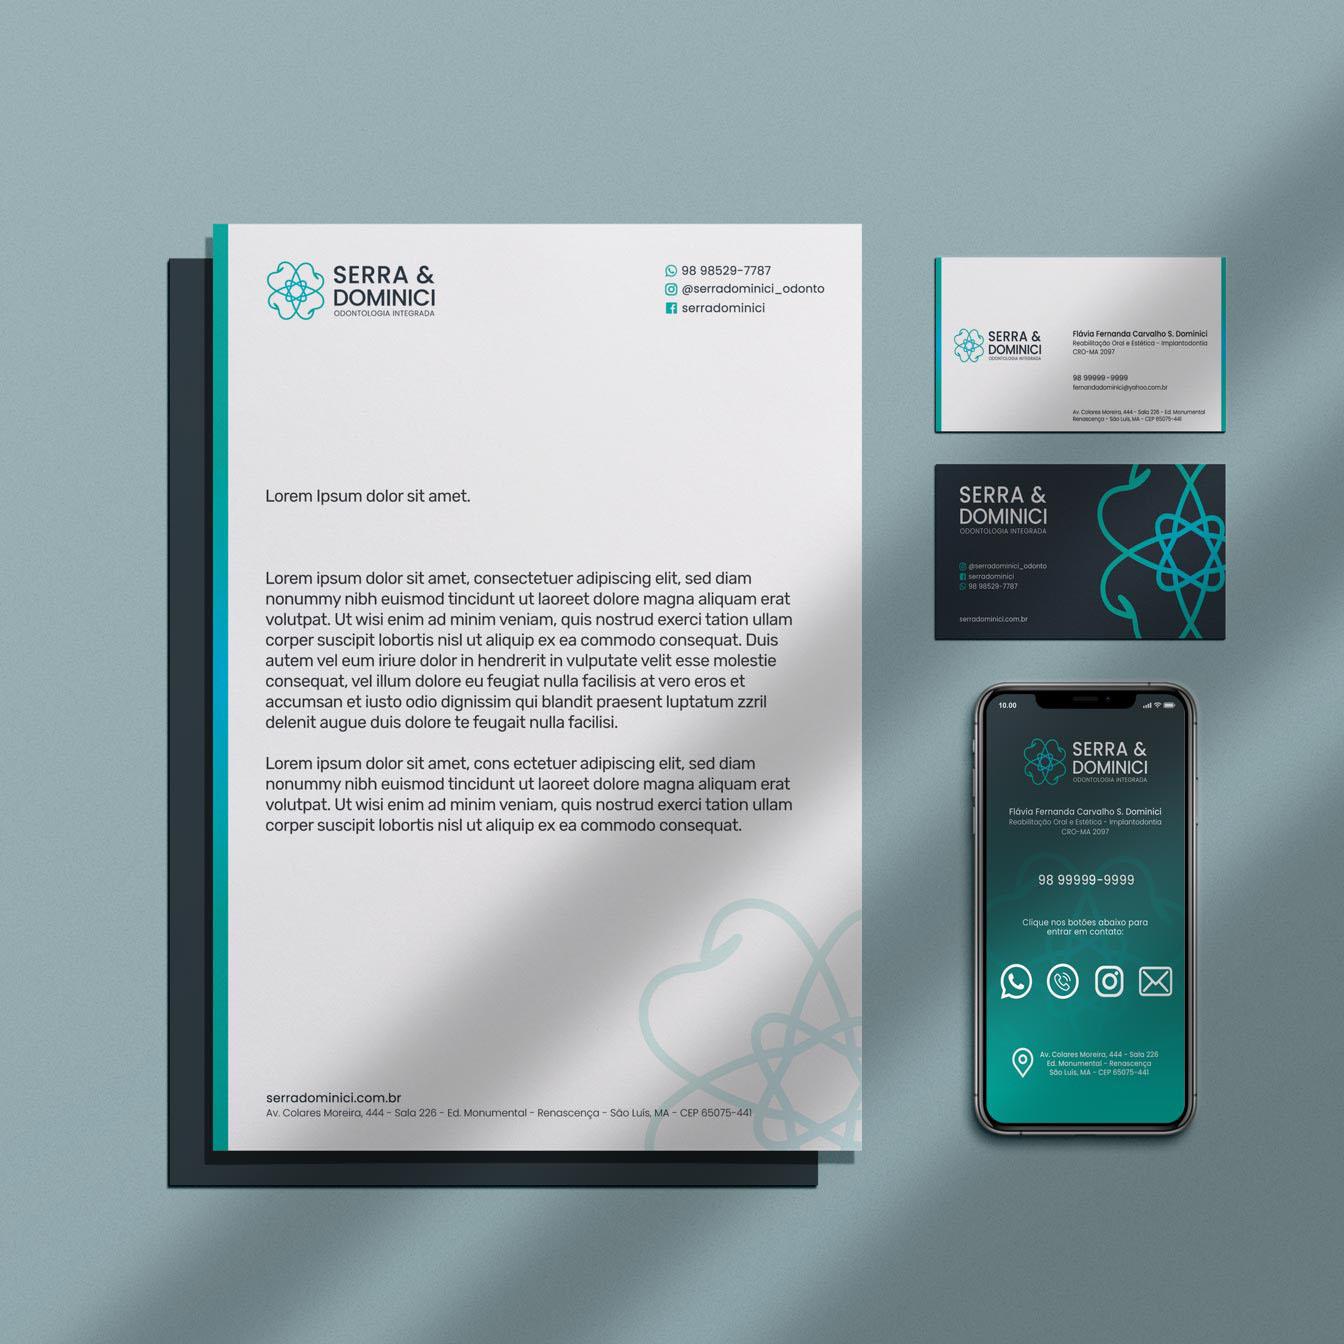 identidade visual serra & dominici odontologia integrada